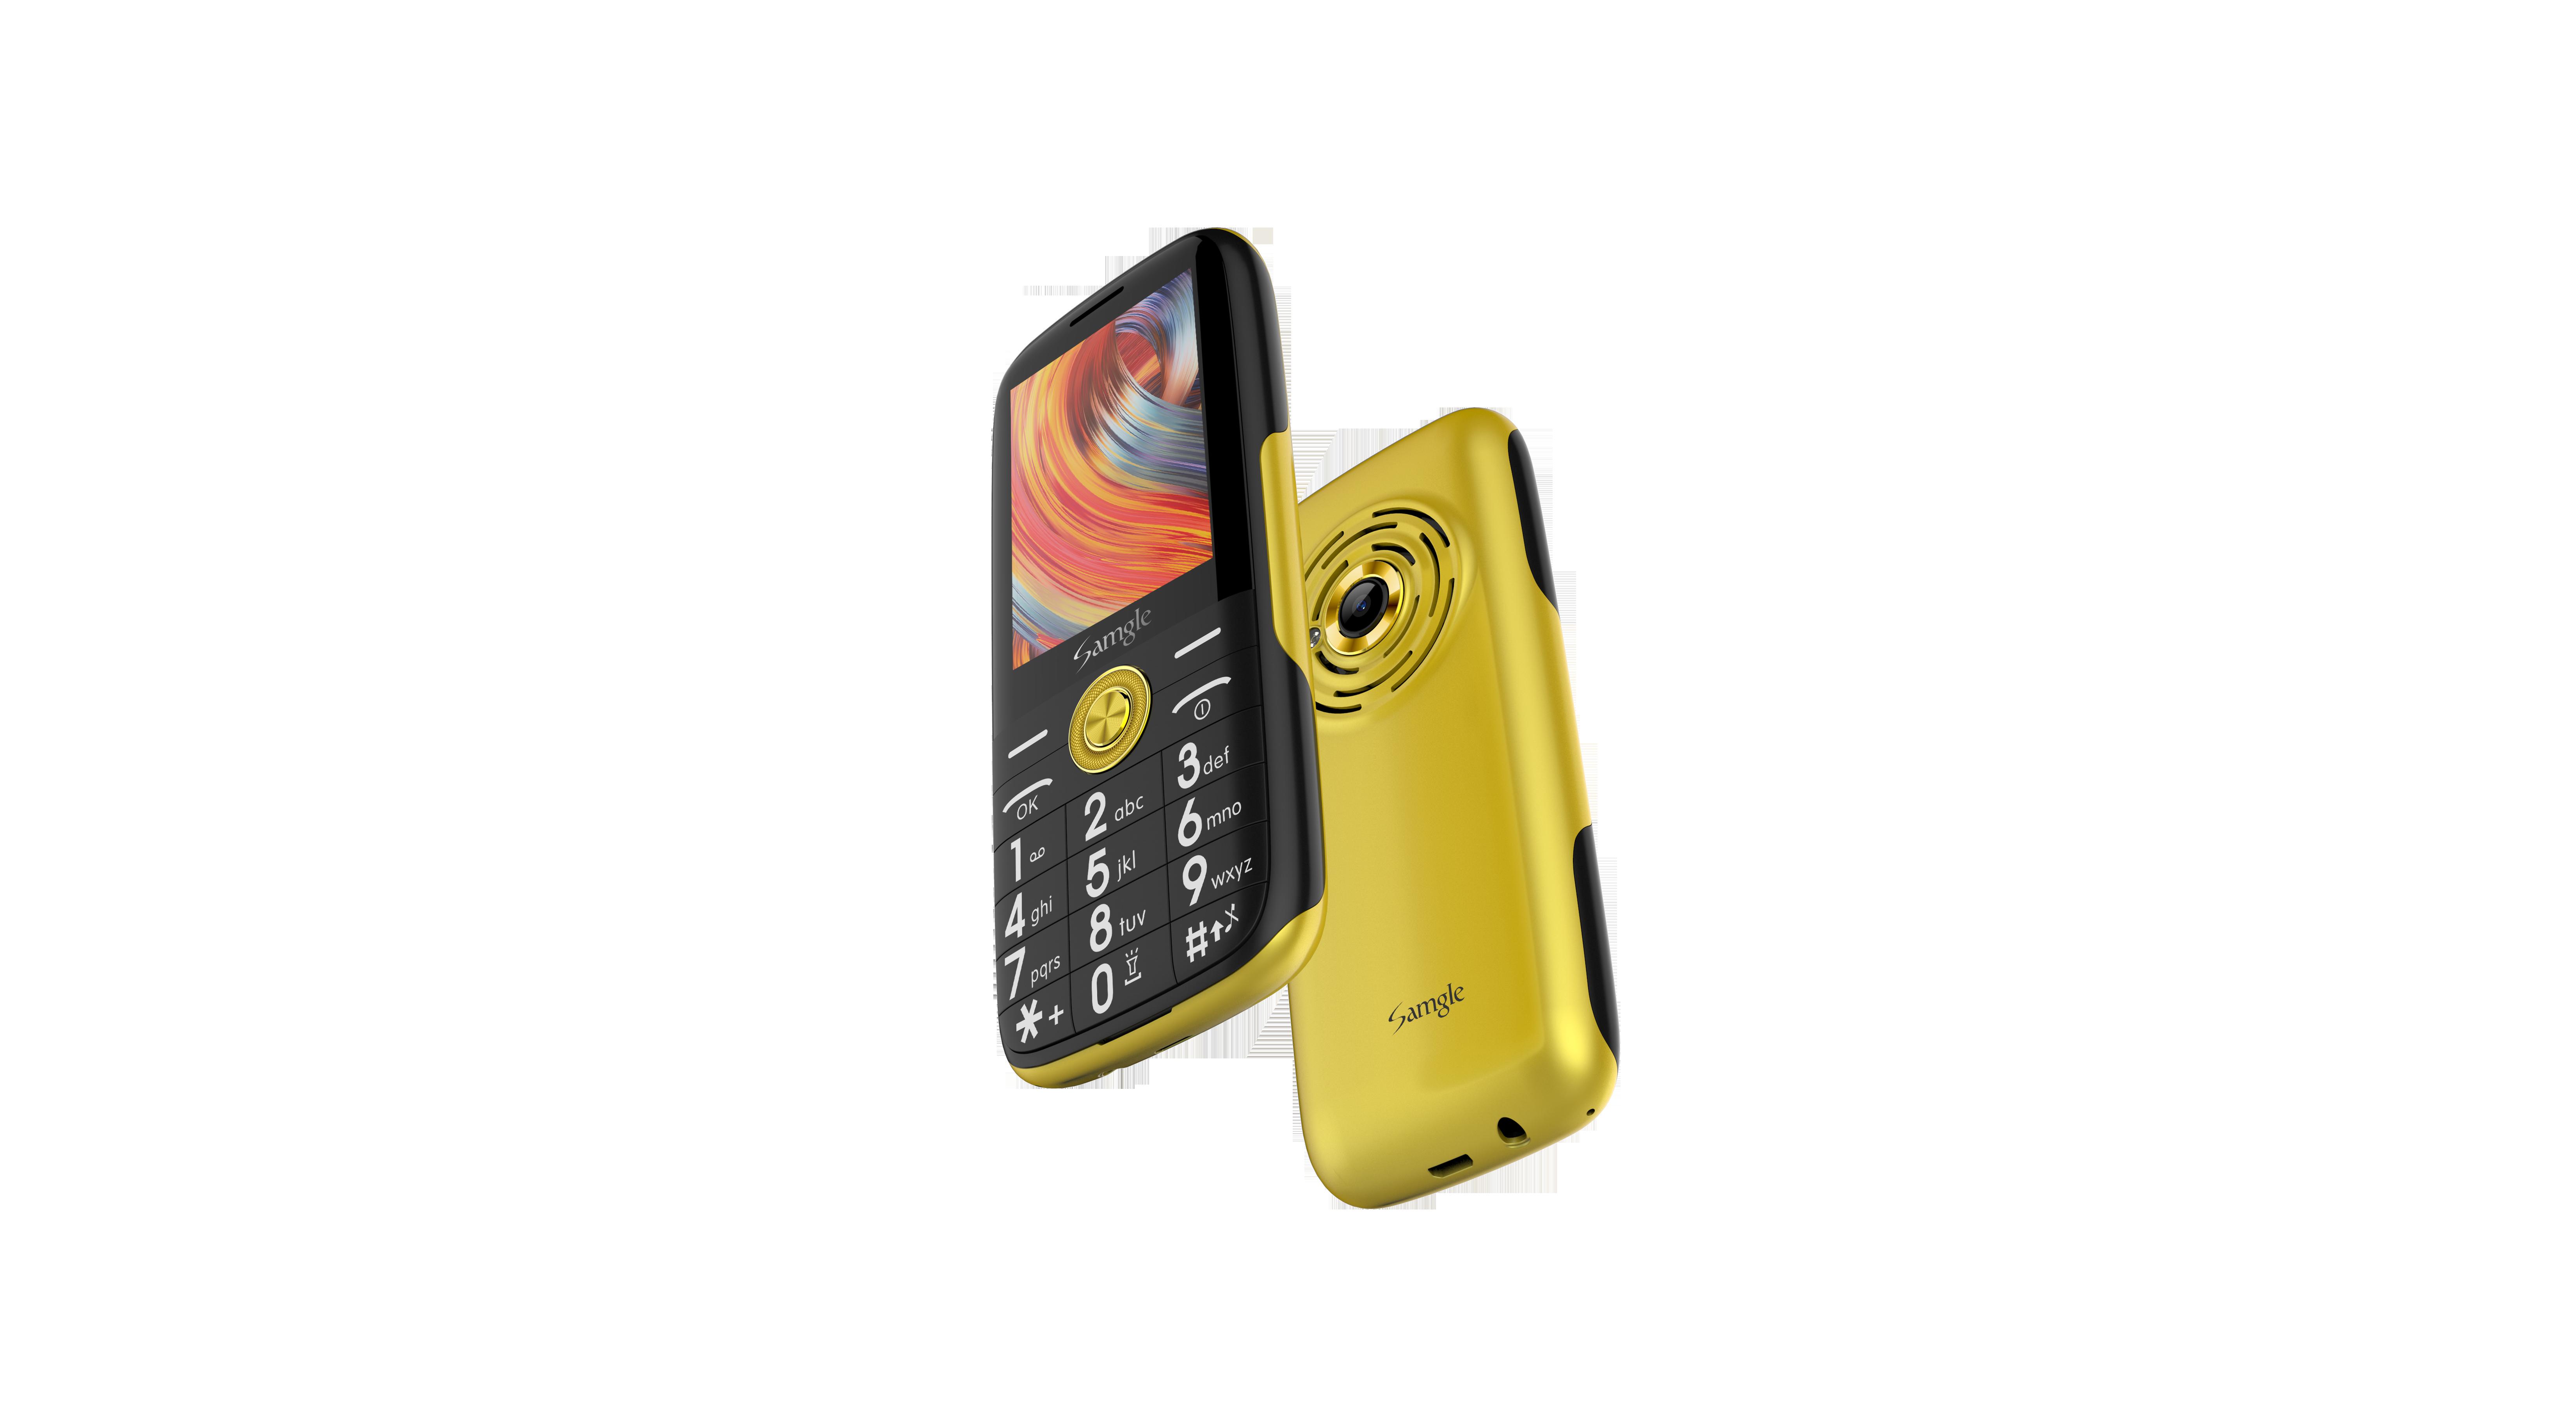 Telefon mobil Samgle Captain 3G, QVGA 2.4 inch, Bluetooth, Digi 3G, Camera, Slot Card, Radio FM, Internet, Dual SIM 17